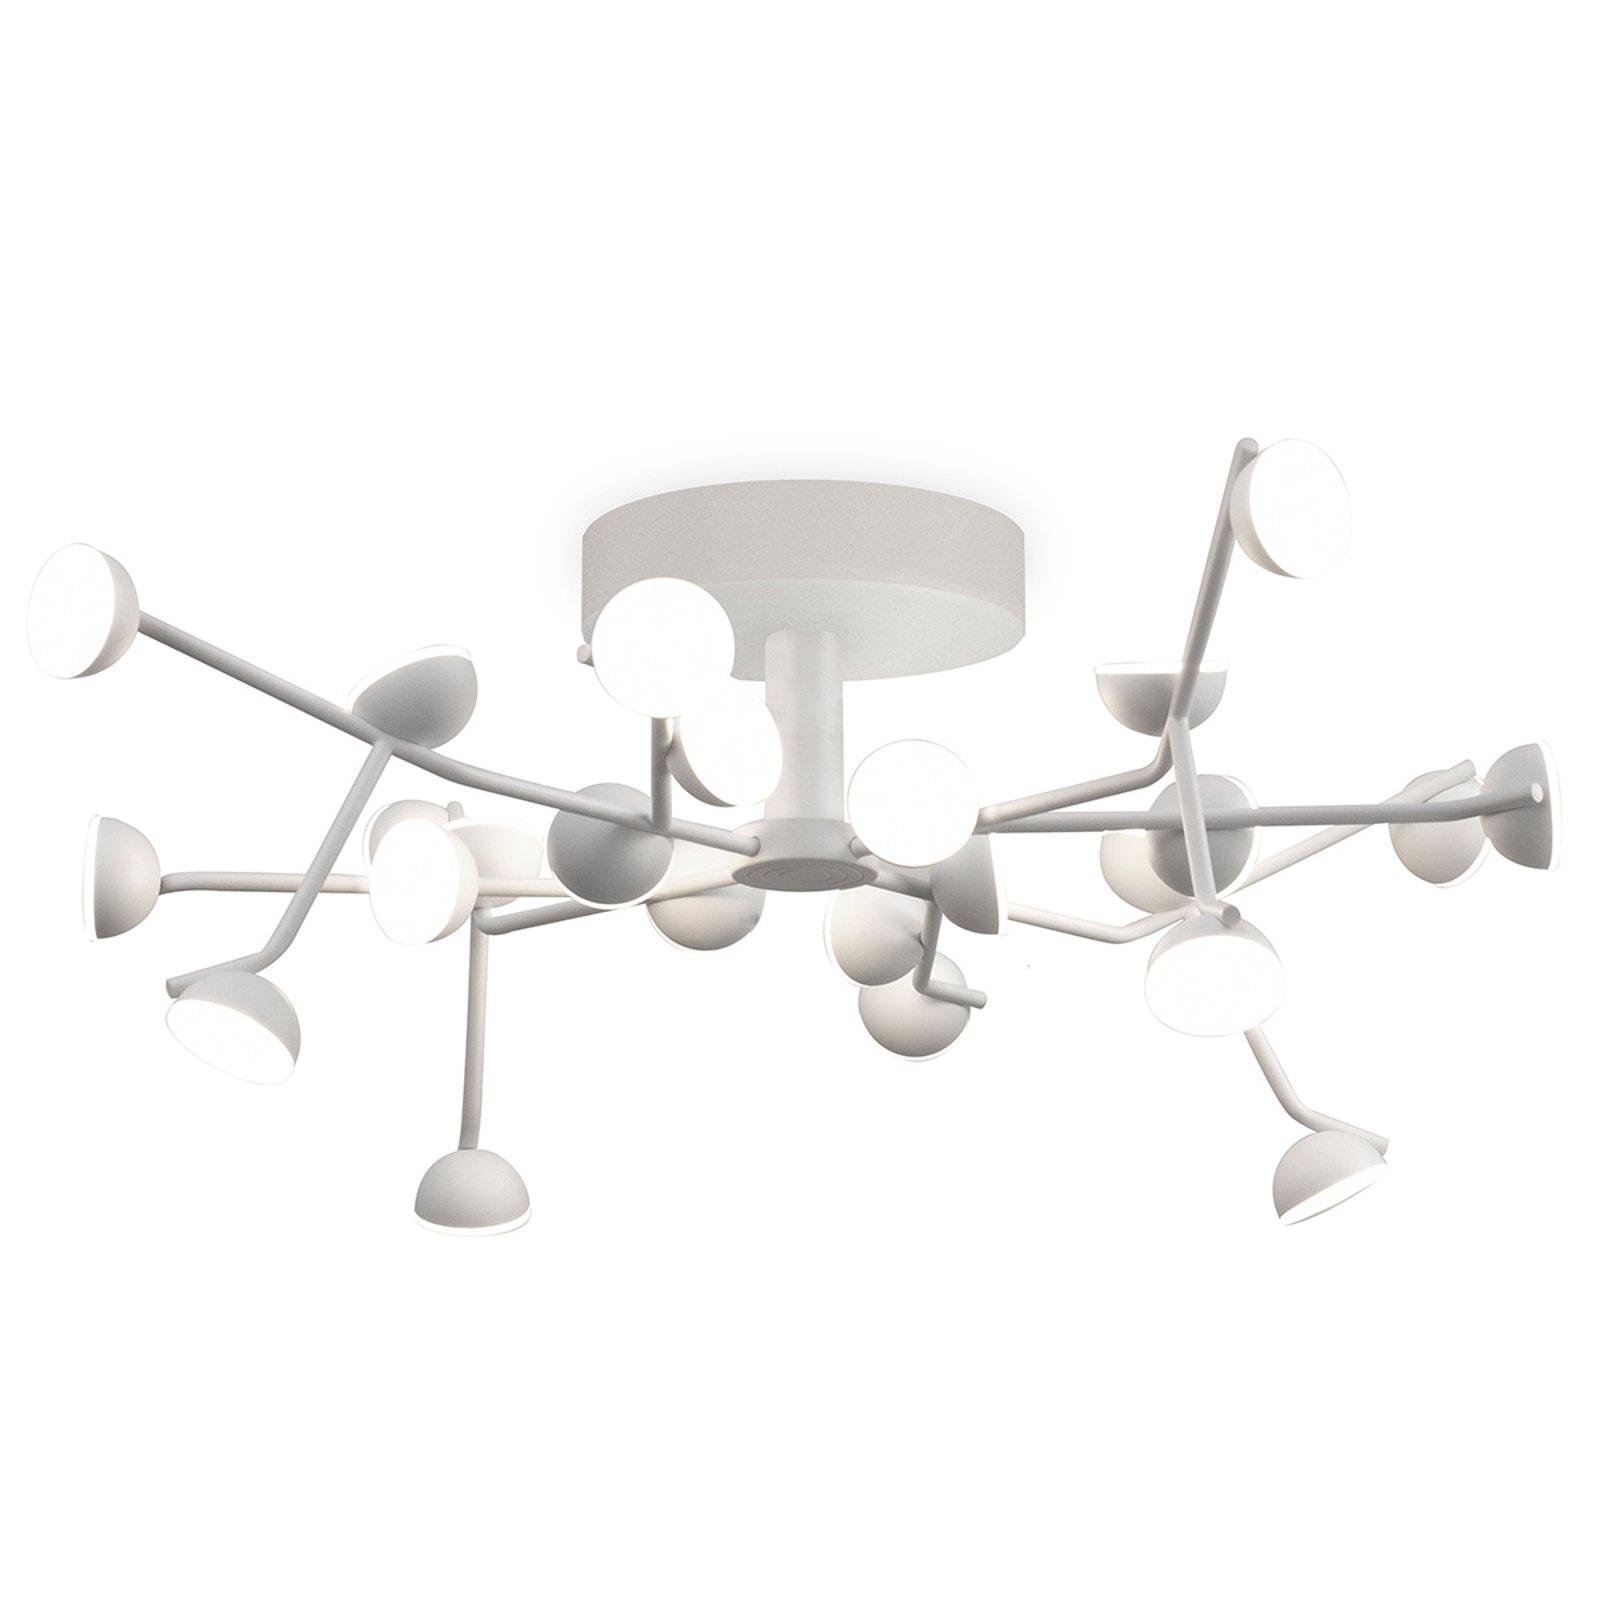 Adn LED-taklampe 24 lyskilder